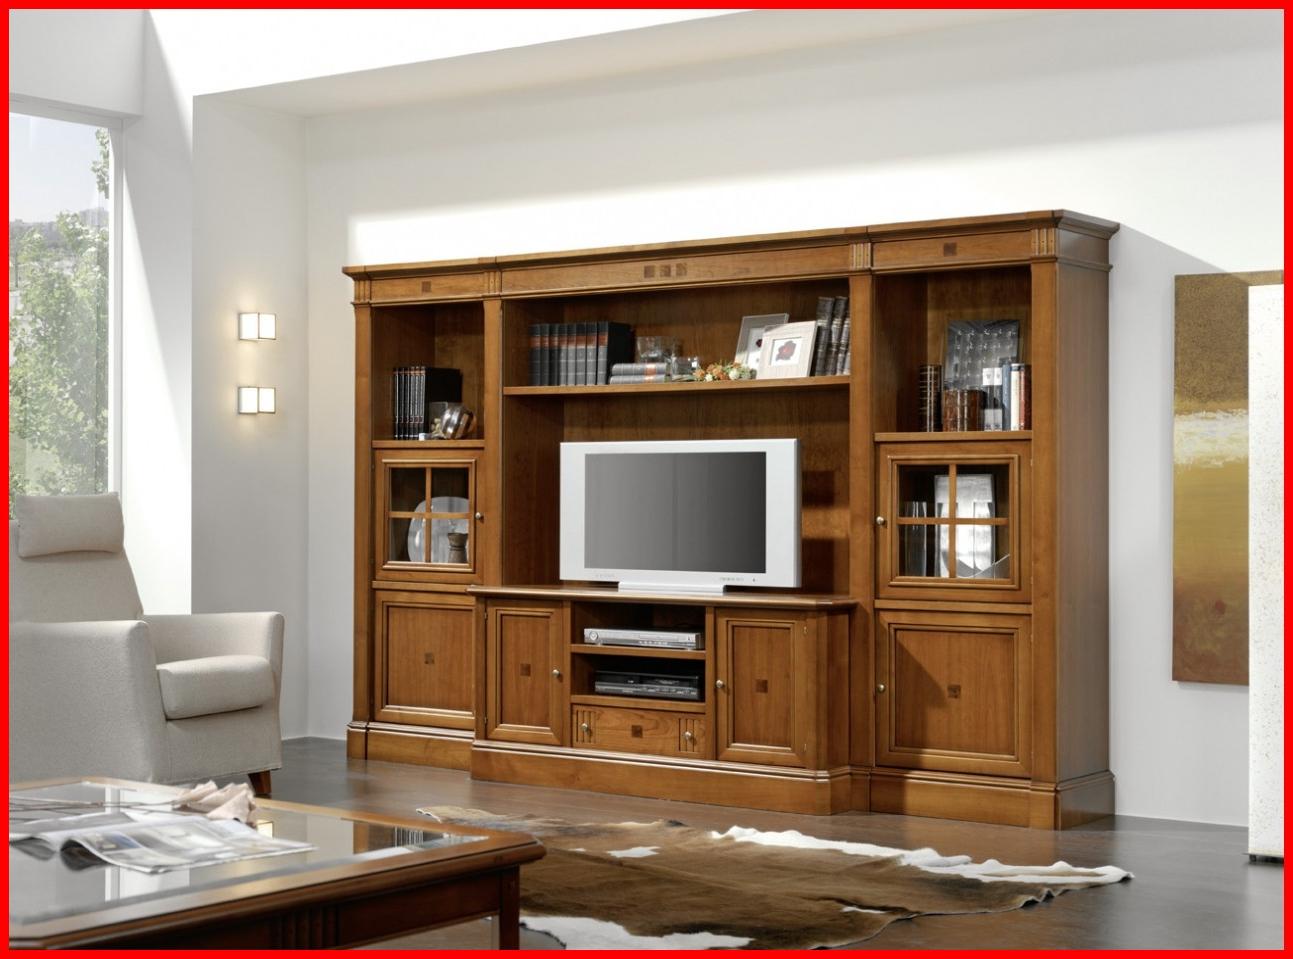 Muebles De Salon Ikea Ofertas Fmdf Muebles De Salon Ikea Ofertas Muebles Muebles Salon Erta Ikea